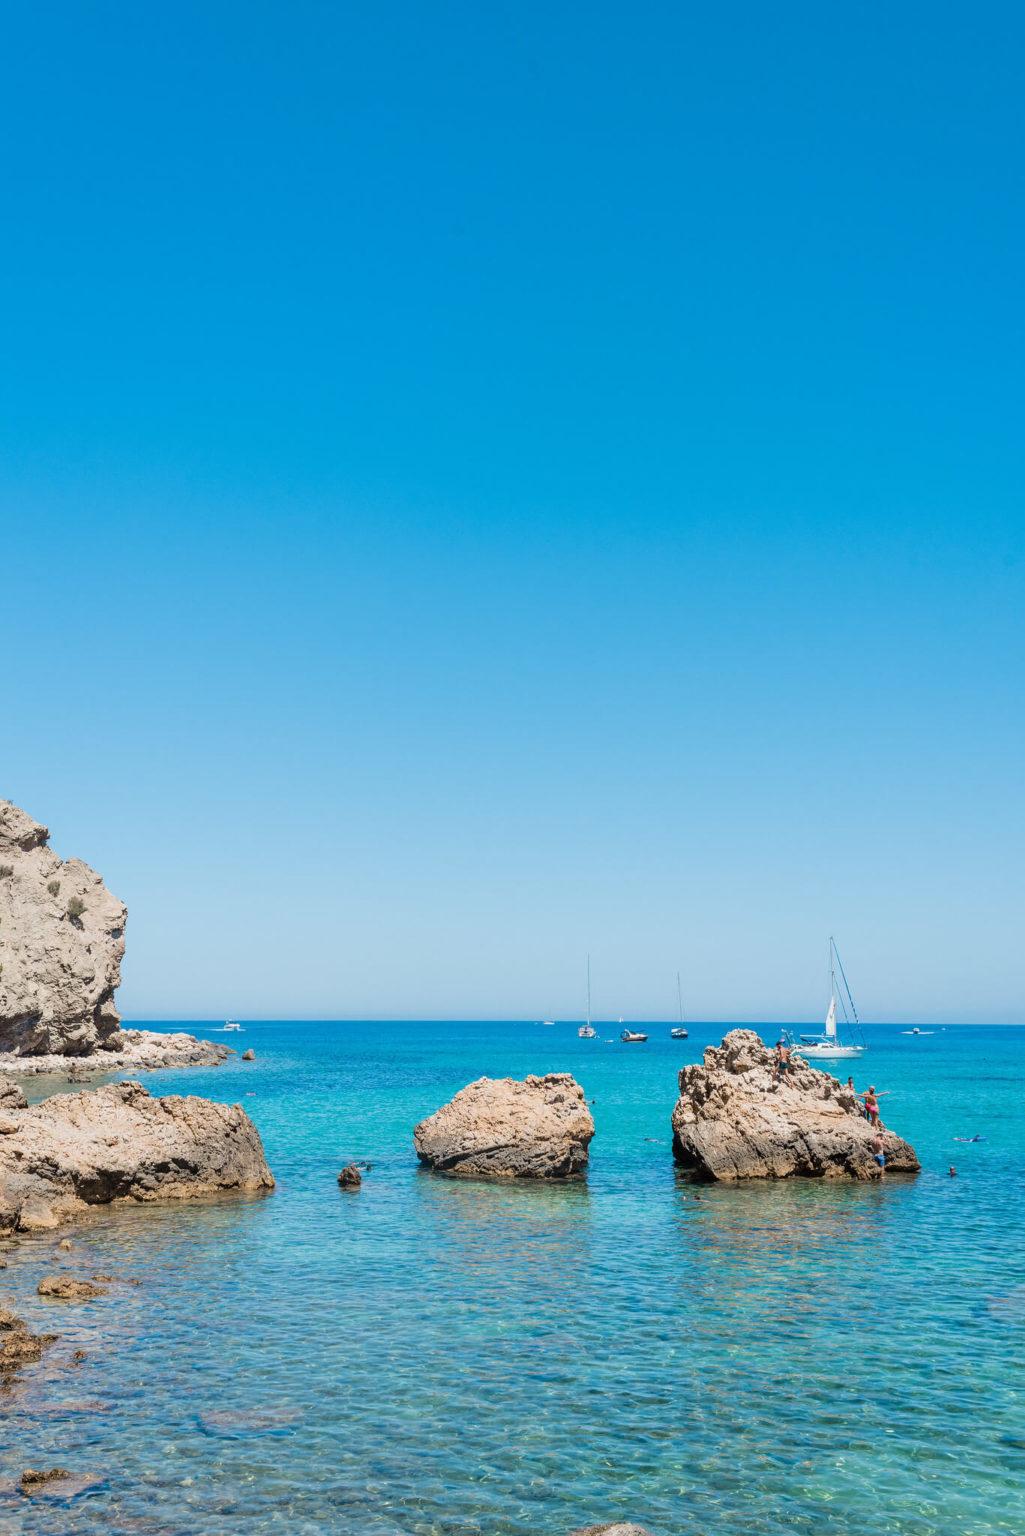 https://www.white-ibiza.com/wp-content/uploads/2020/03/ibiza-beaches-cala-xaracca-05-1025x1536.jpg